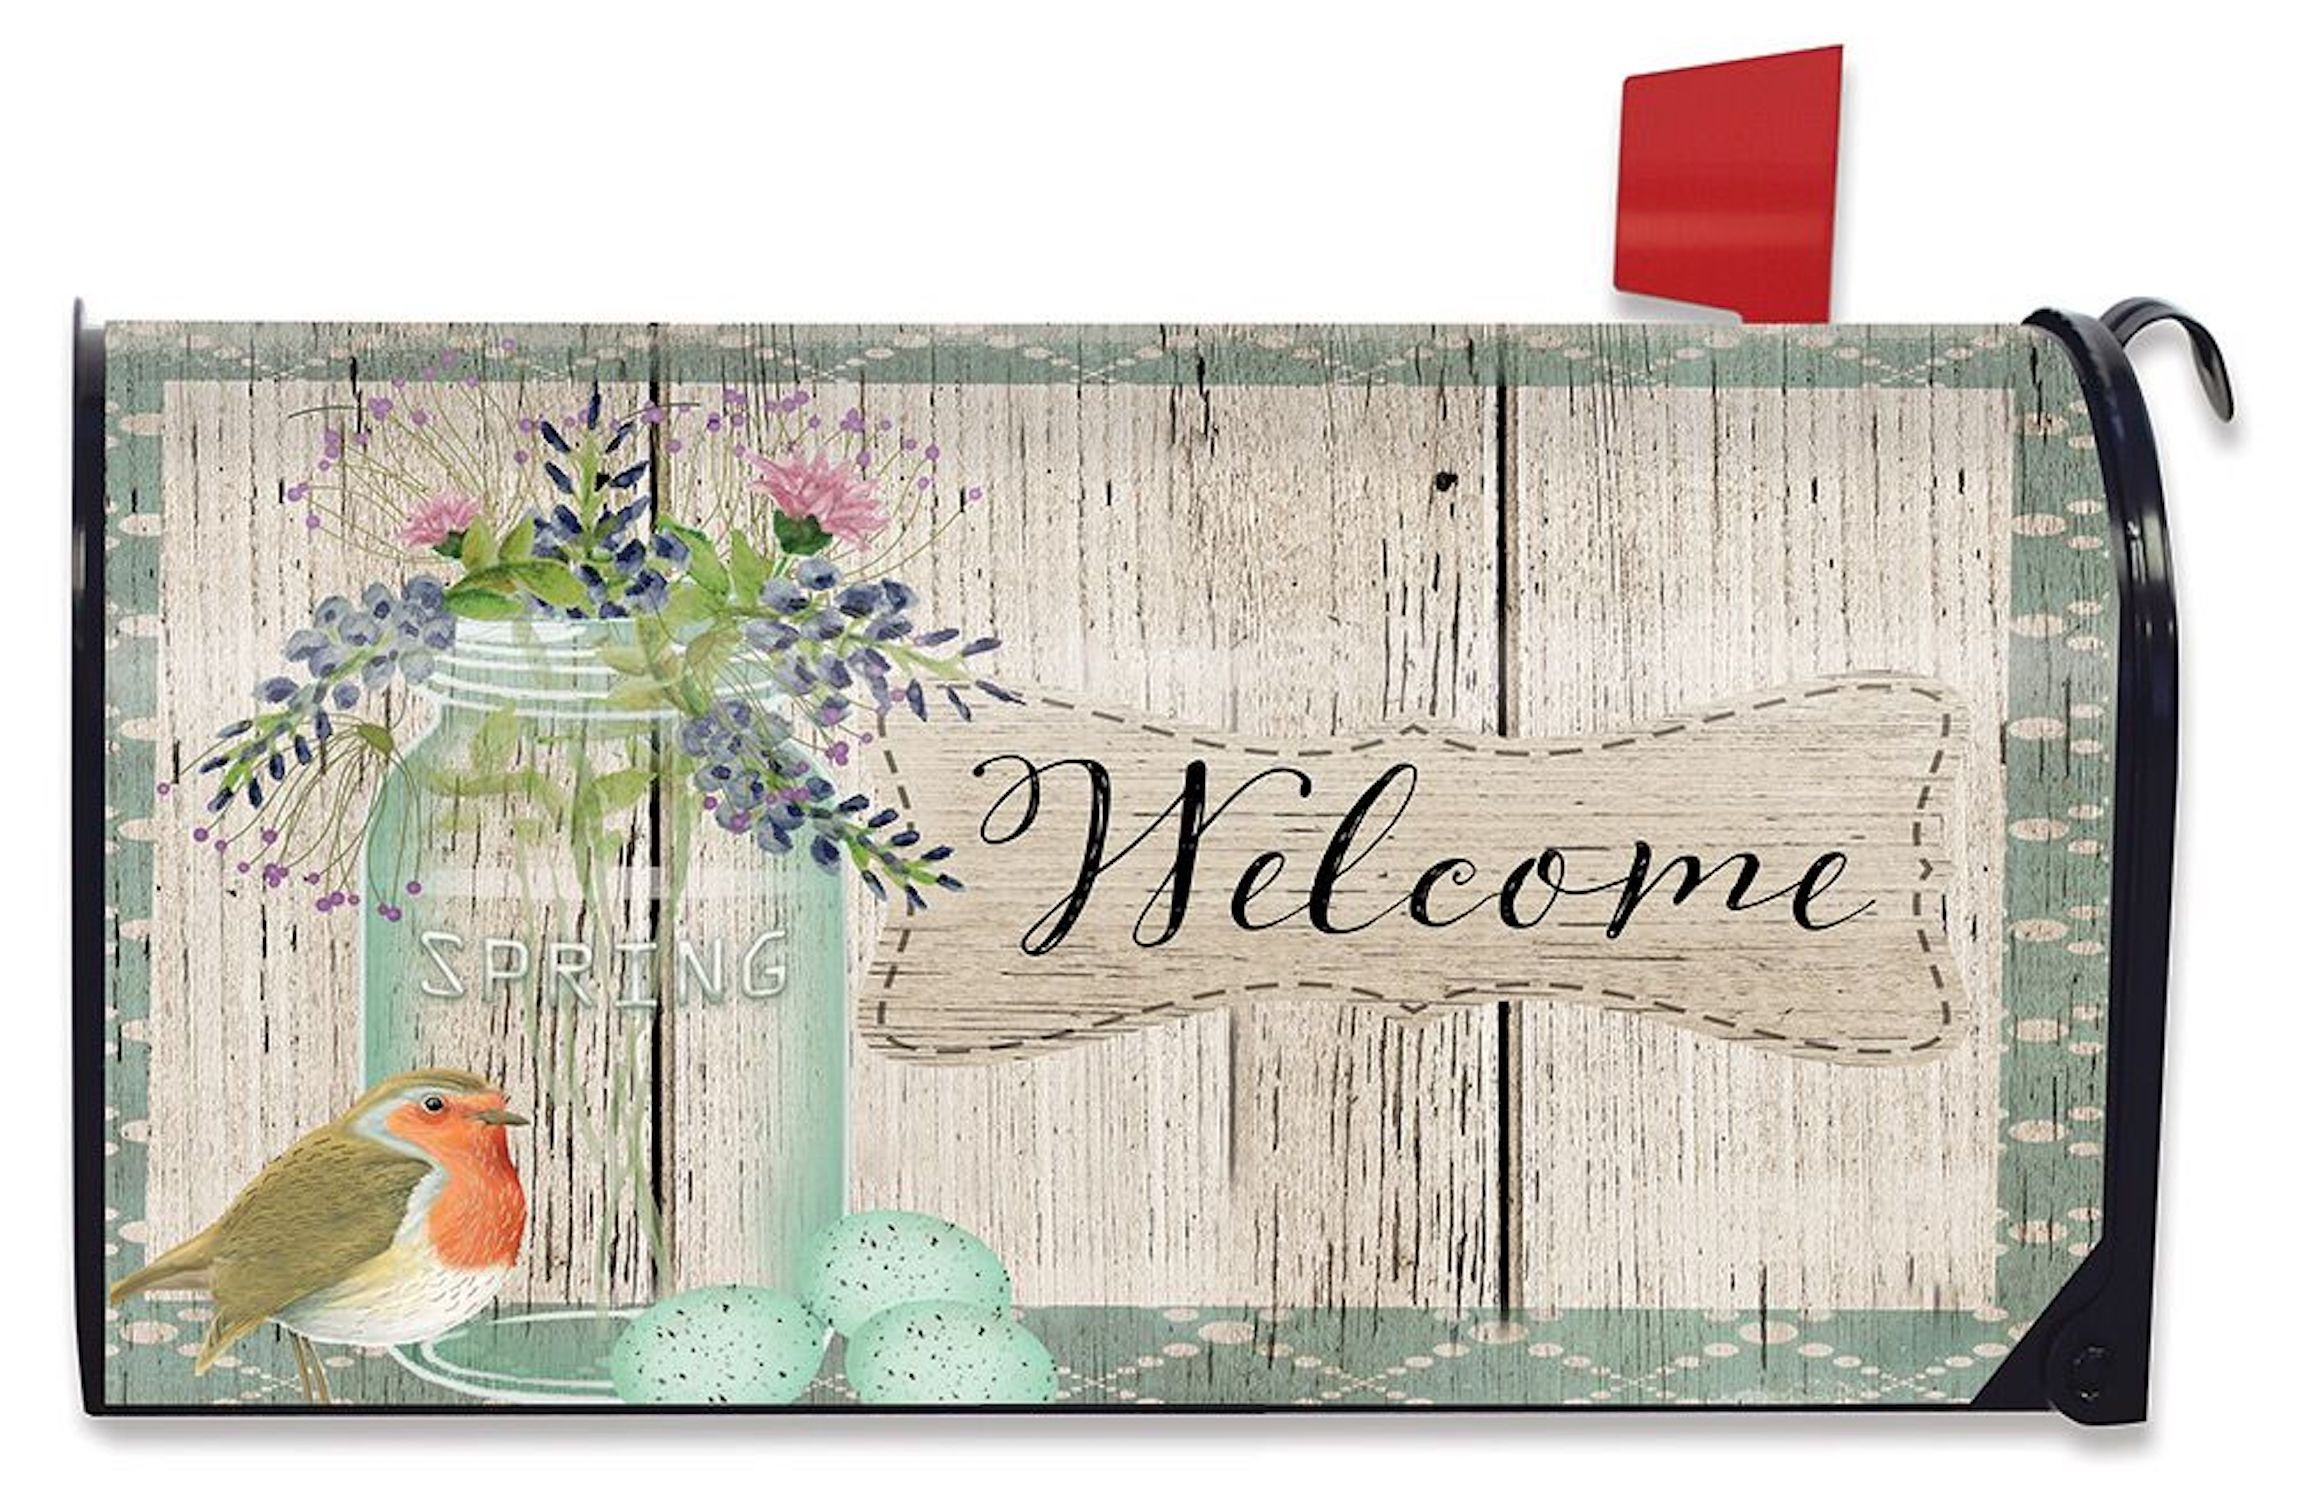 Briarwood Lane Springtime Welcome Floral Mailbox Cover Rustic Mason Jar Bird Eggs Standard